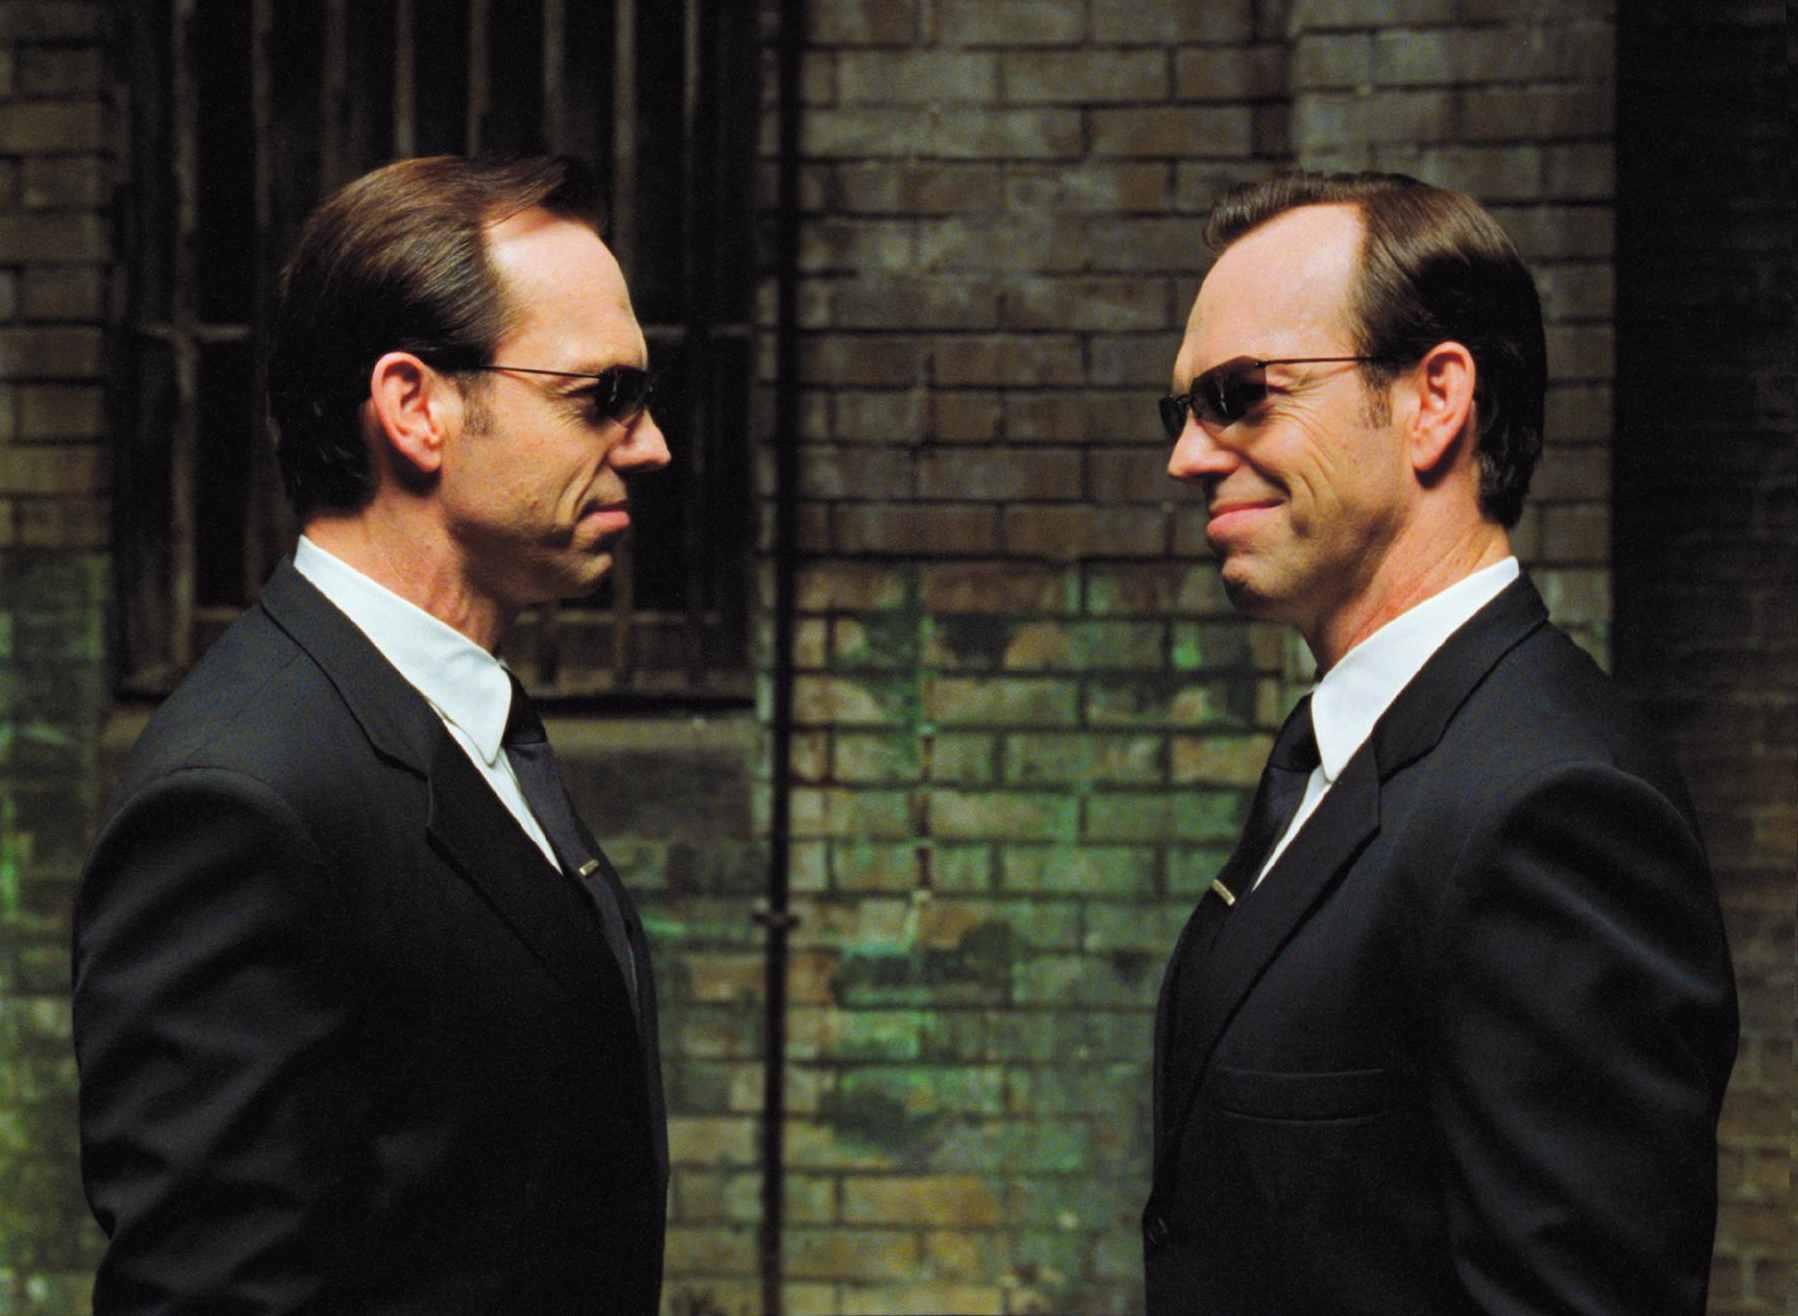 Hugo Weaving in The Matrix Reloaded (2003)